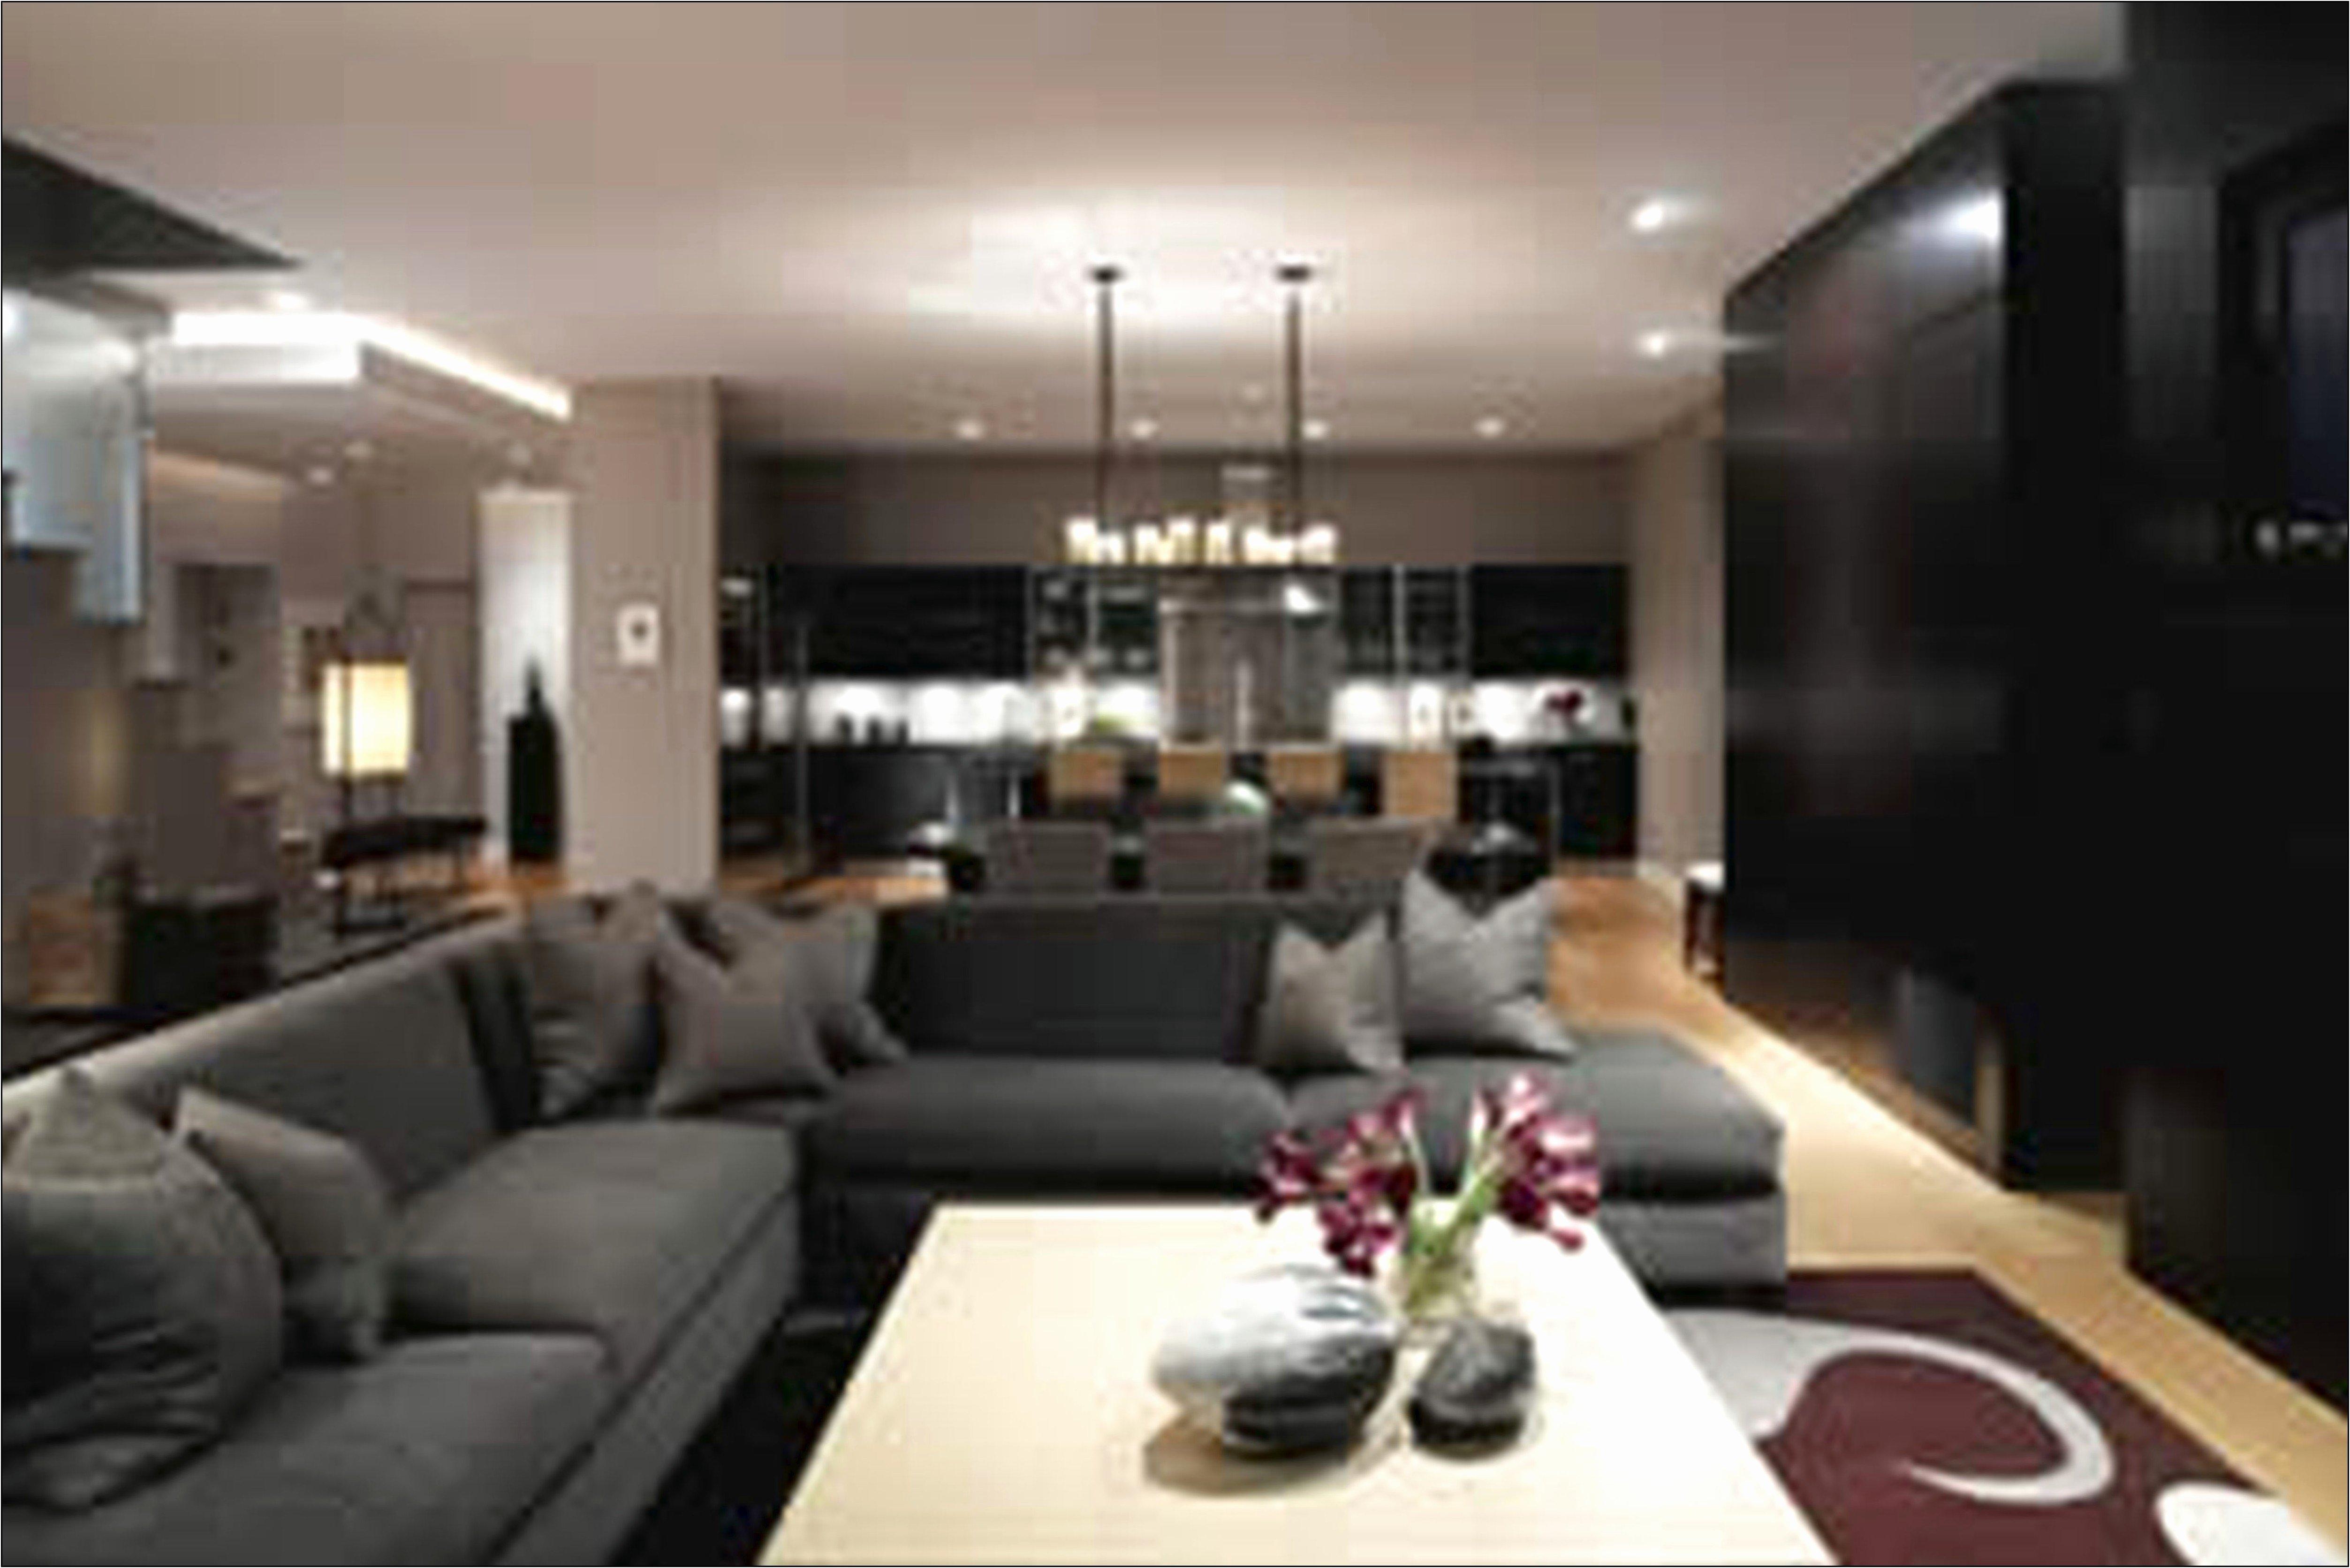 10 Awesome Living Room Ideas For Men fresh living room ideas men living room ideas living room ideas